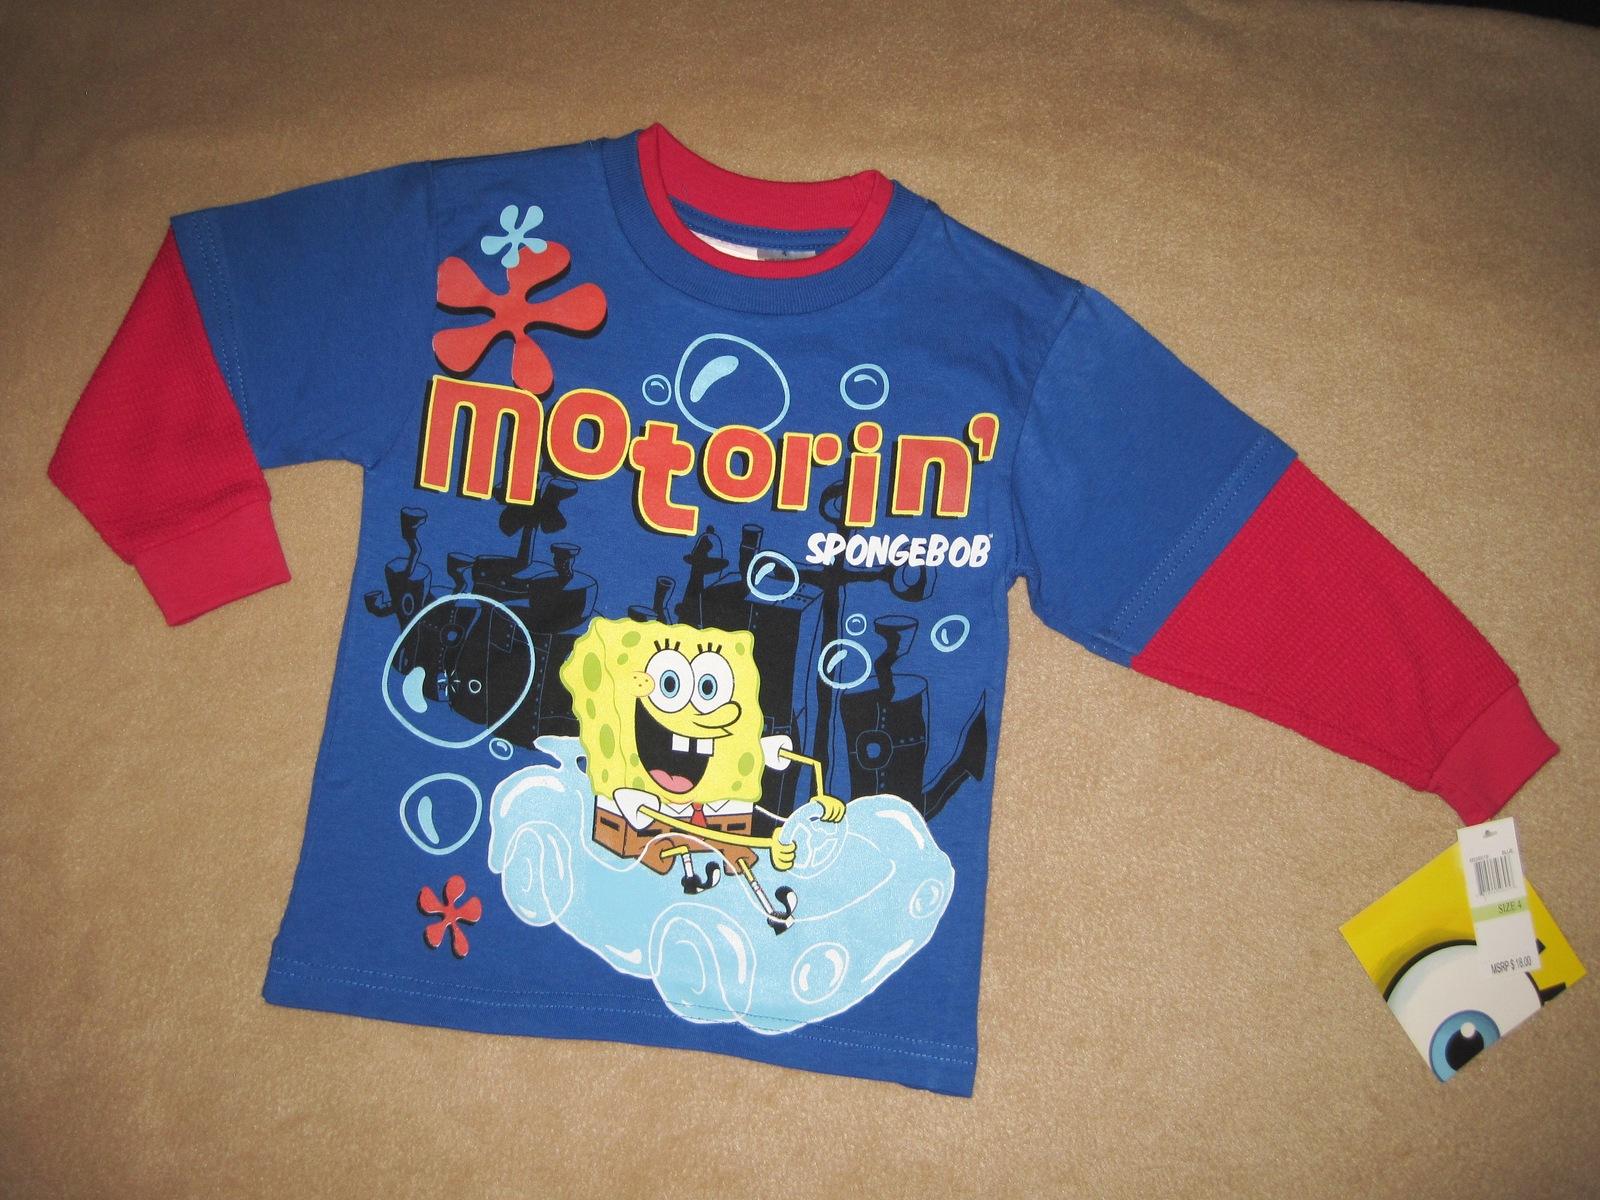 Nickelodeon   motorin  spongebob squarepants long sleeved shirt1